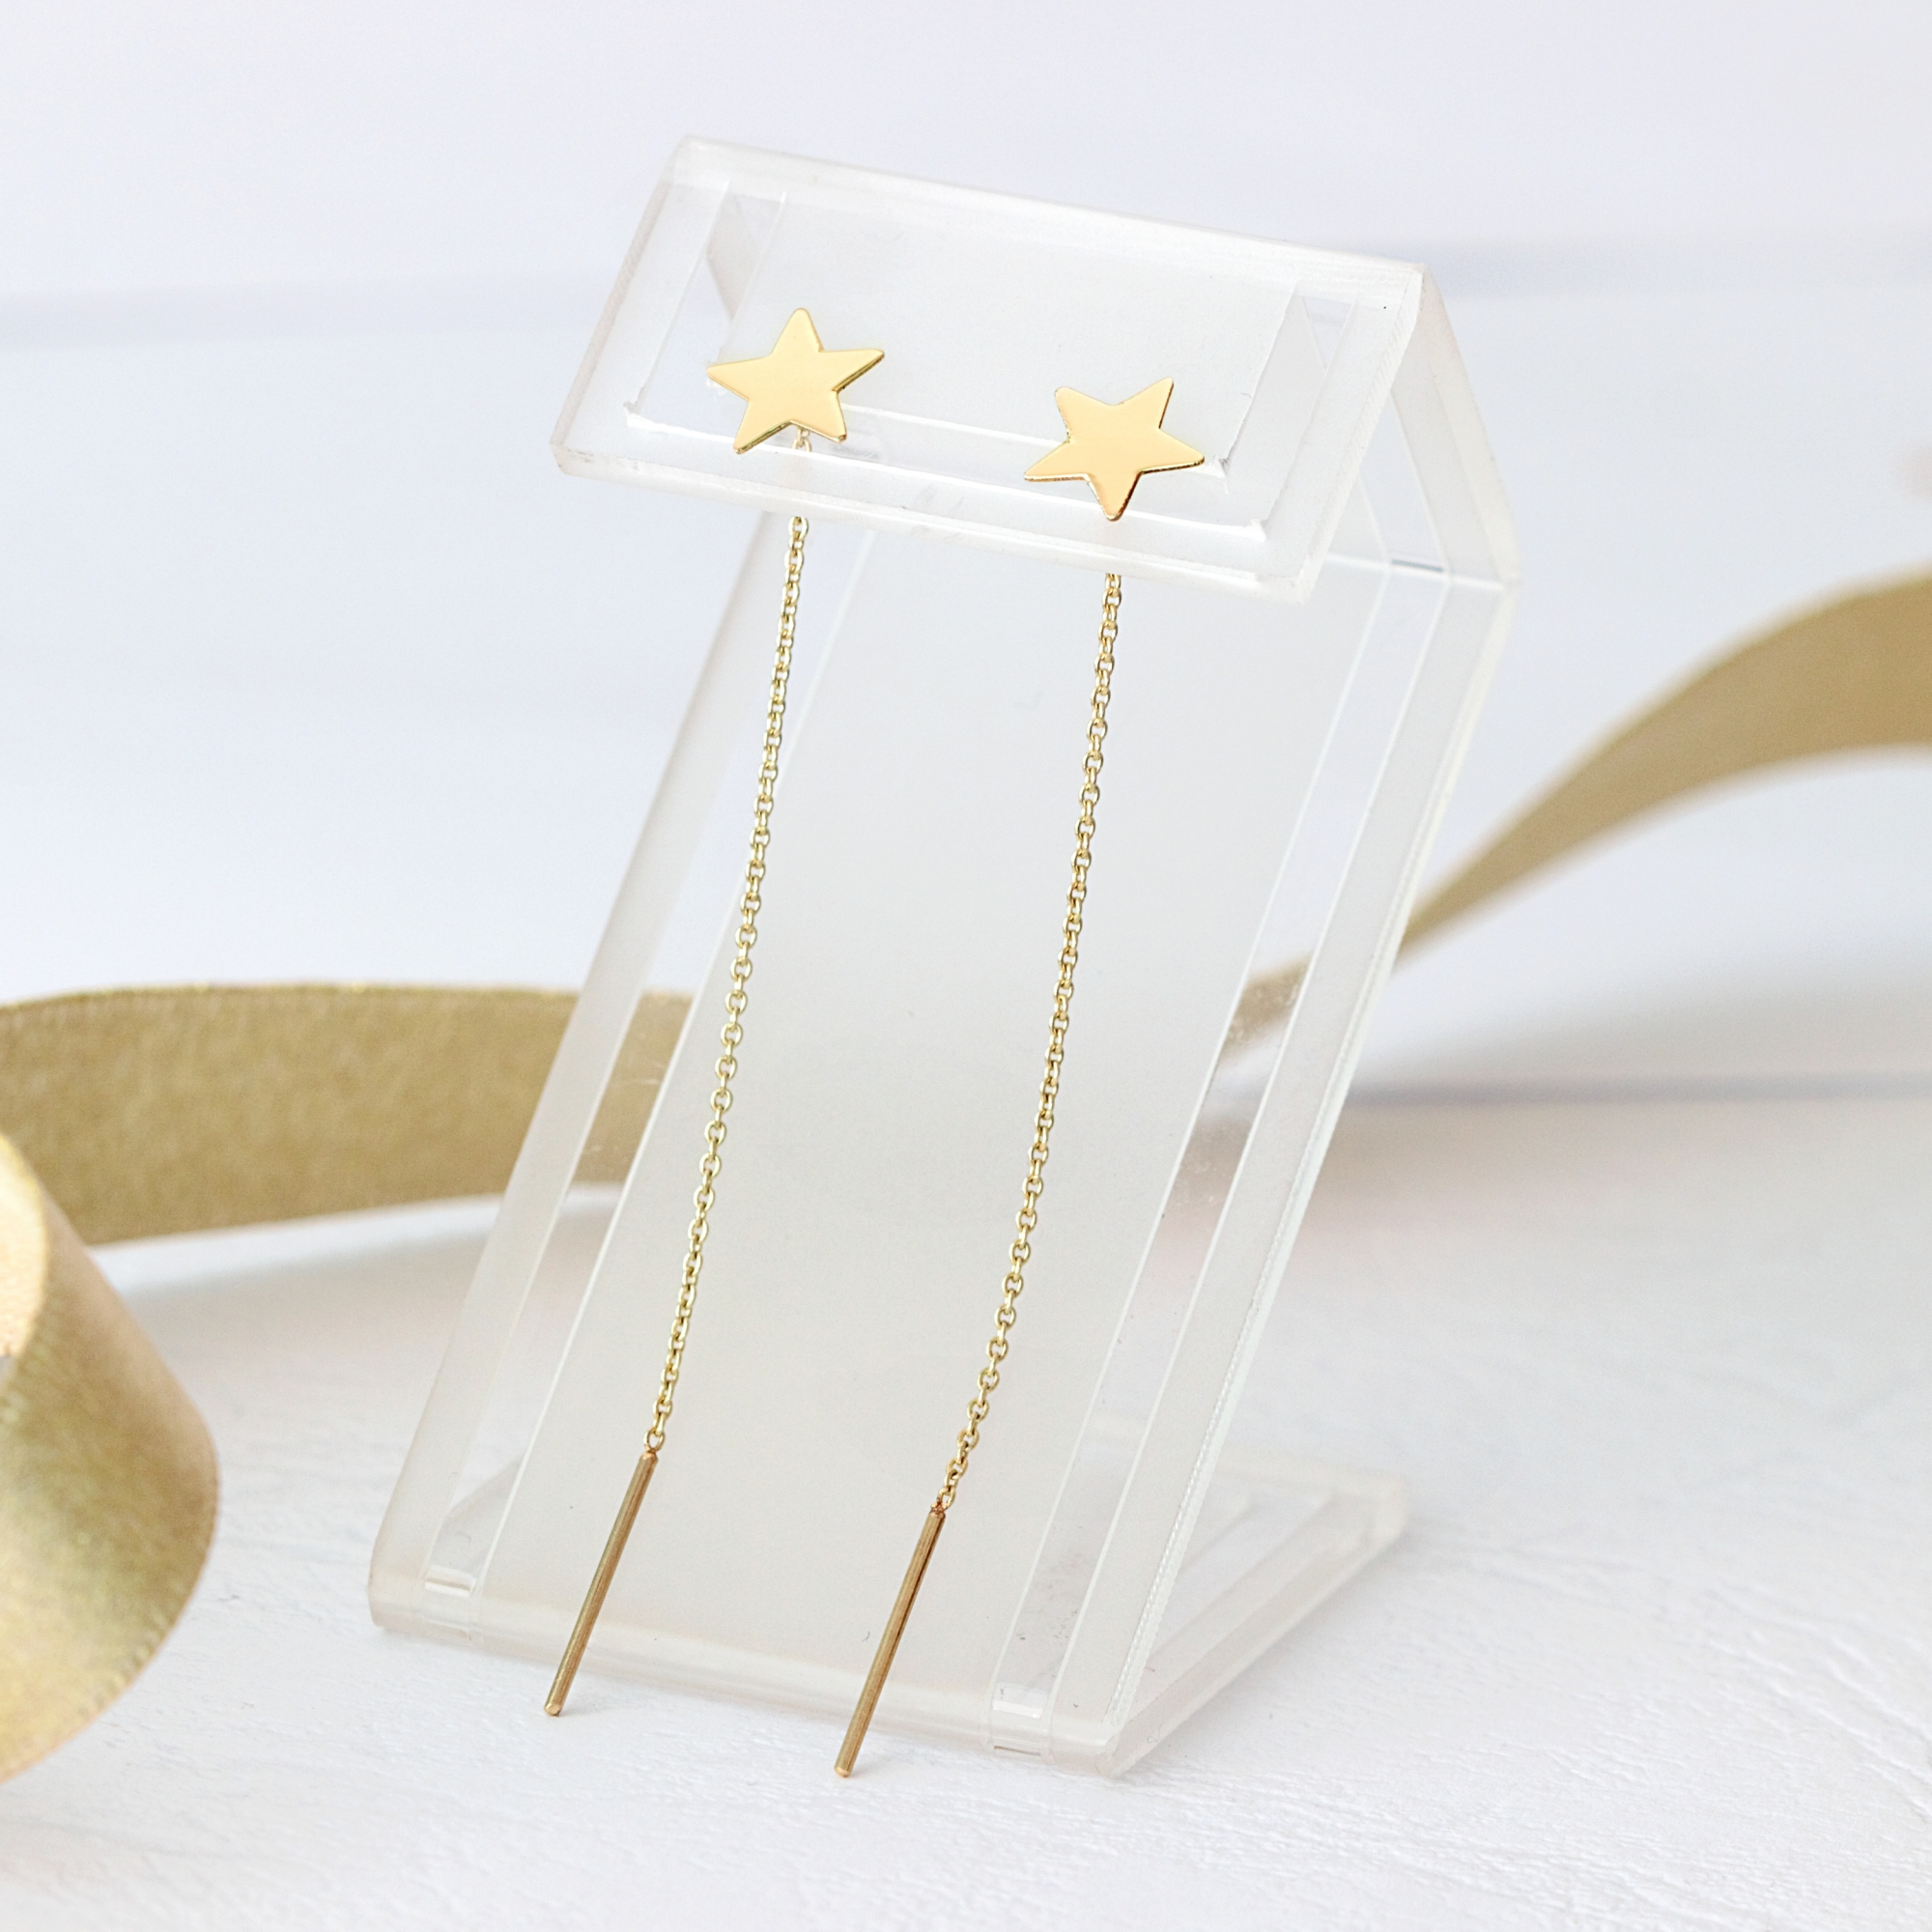 Cercei stelute – cu lant – din aur galben, alb sau roz de 14K